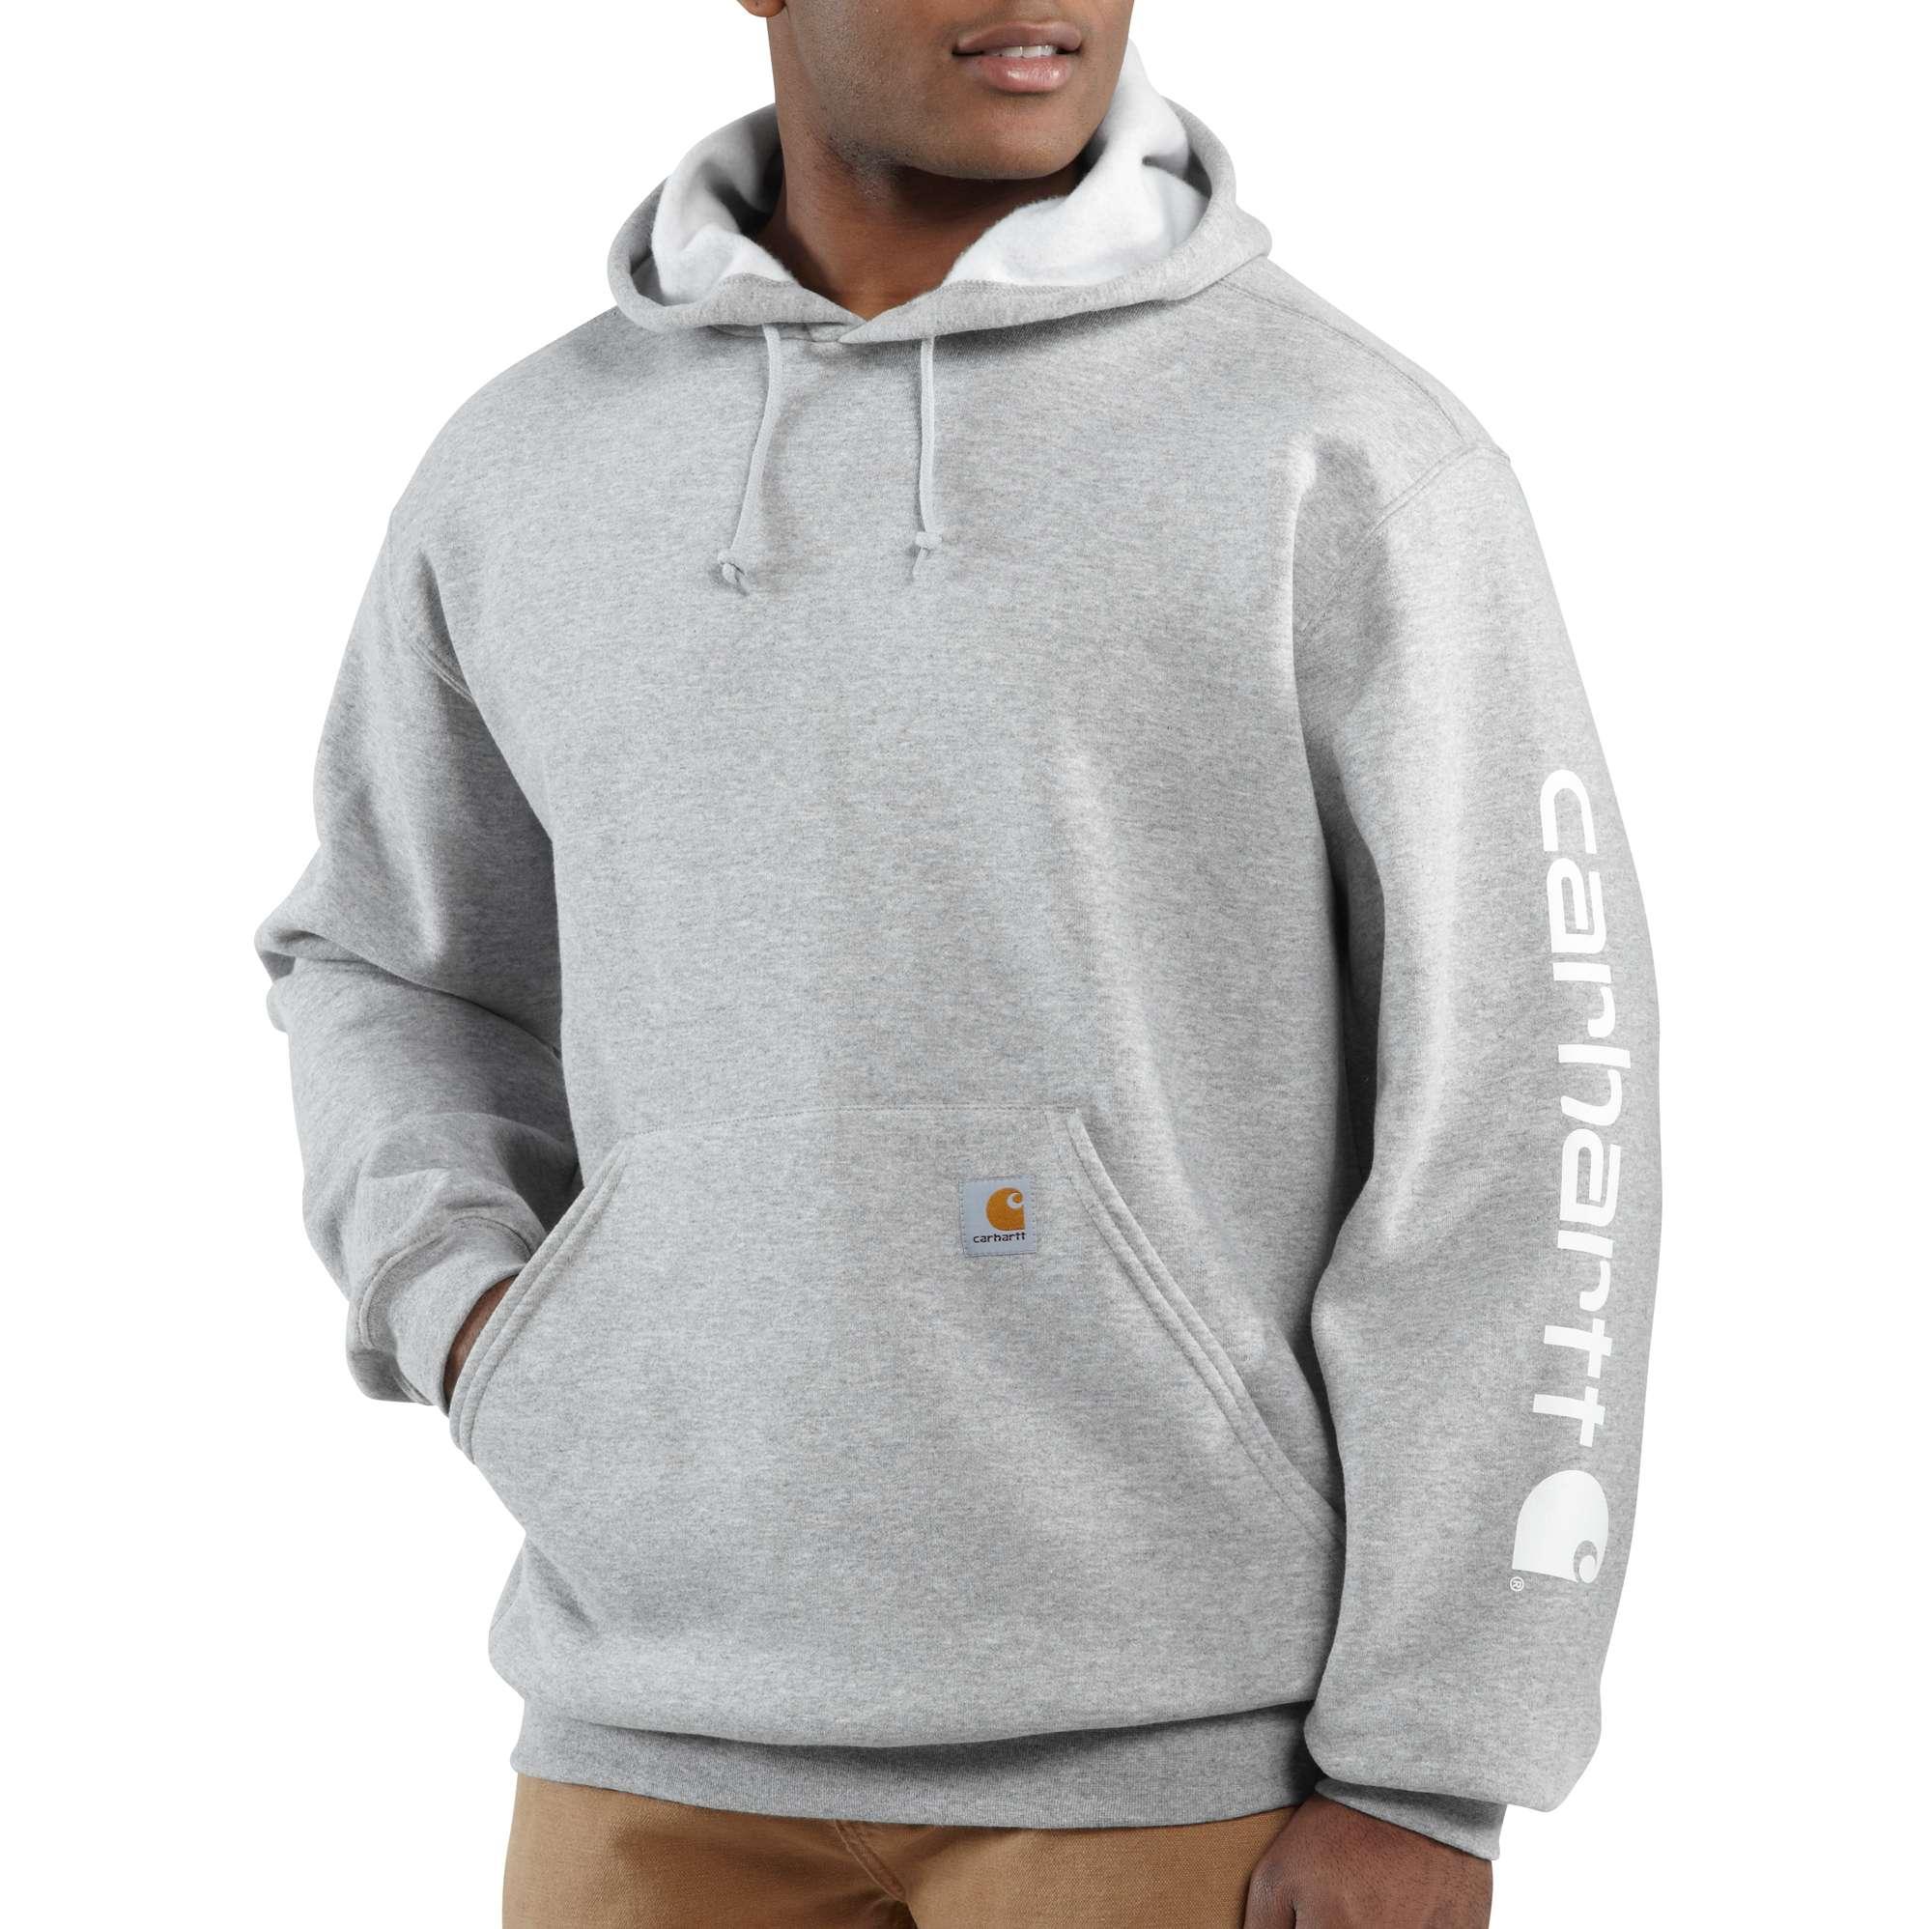 Men's Signature Sleeve Logo Hooded Sweatshirt, Gray, swatch